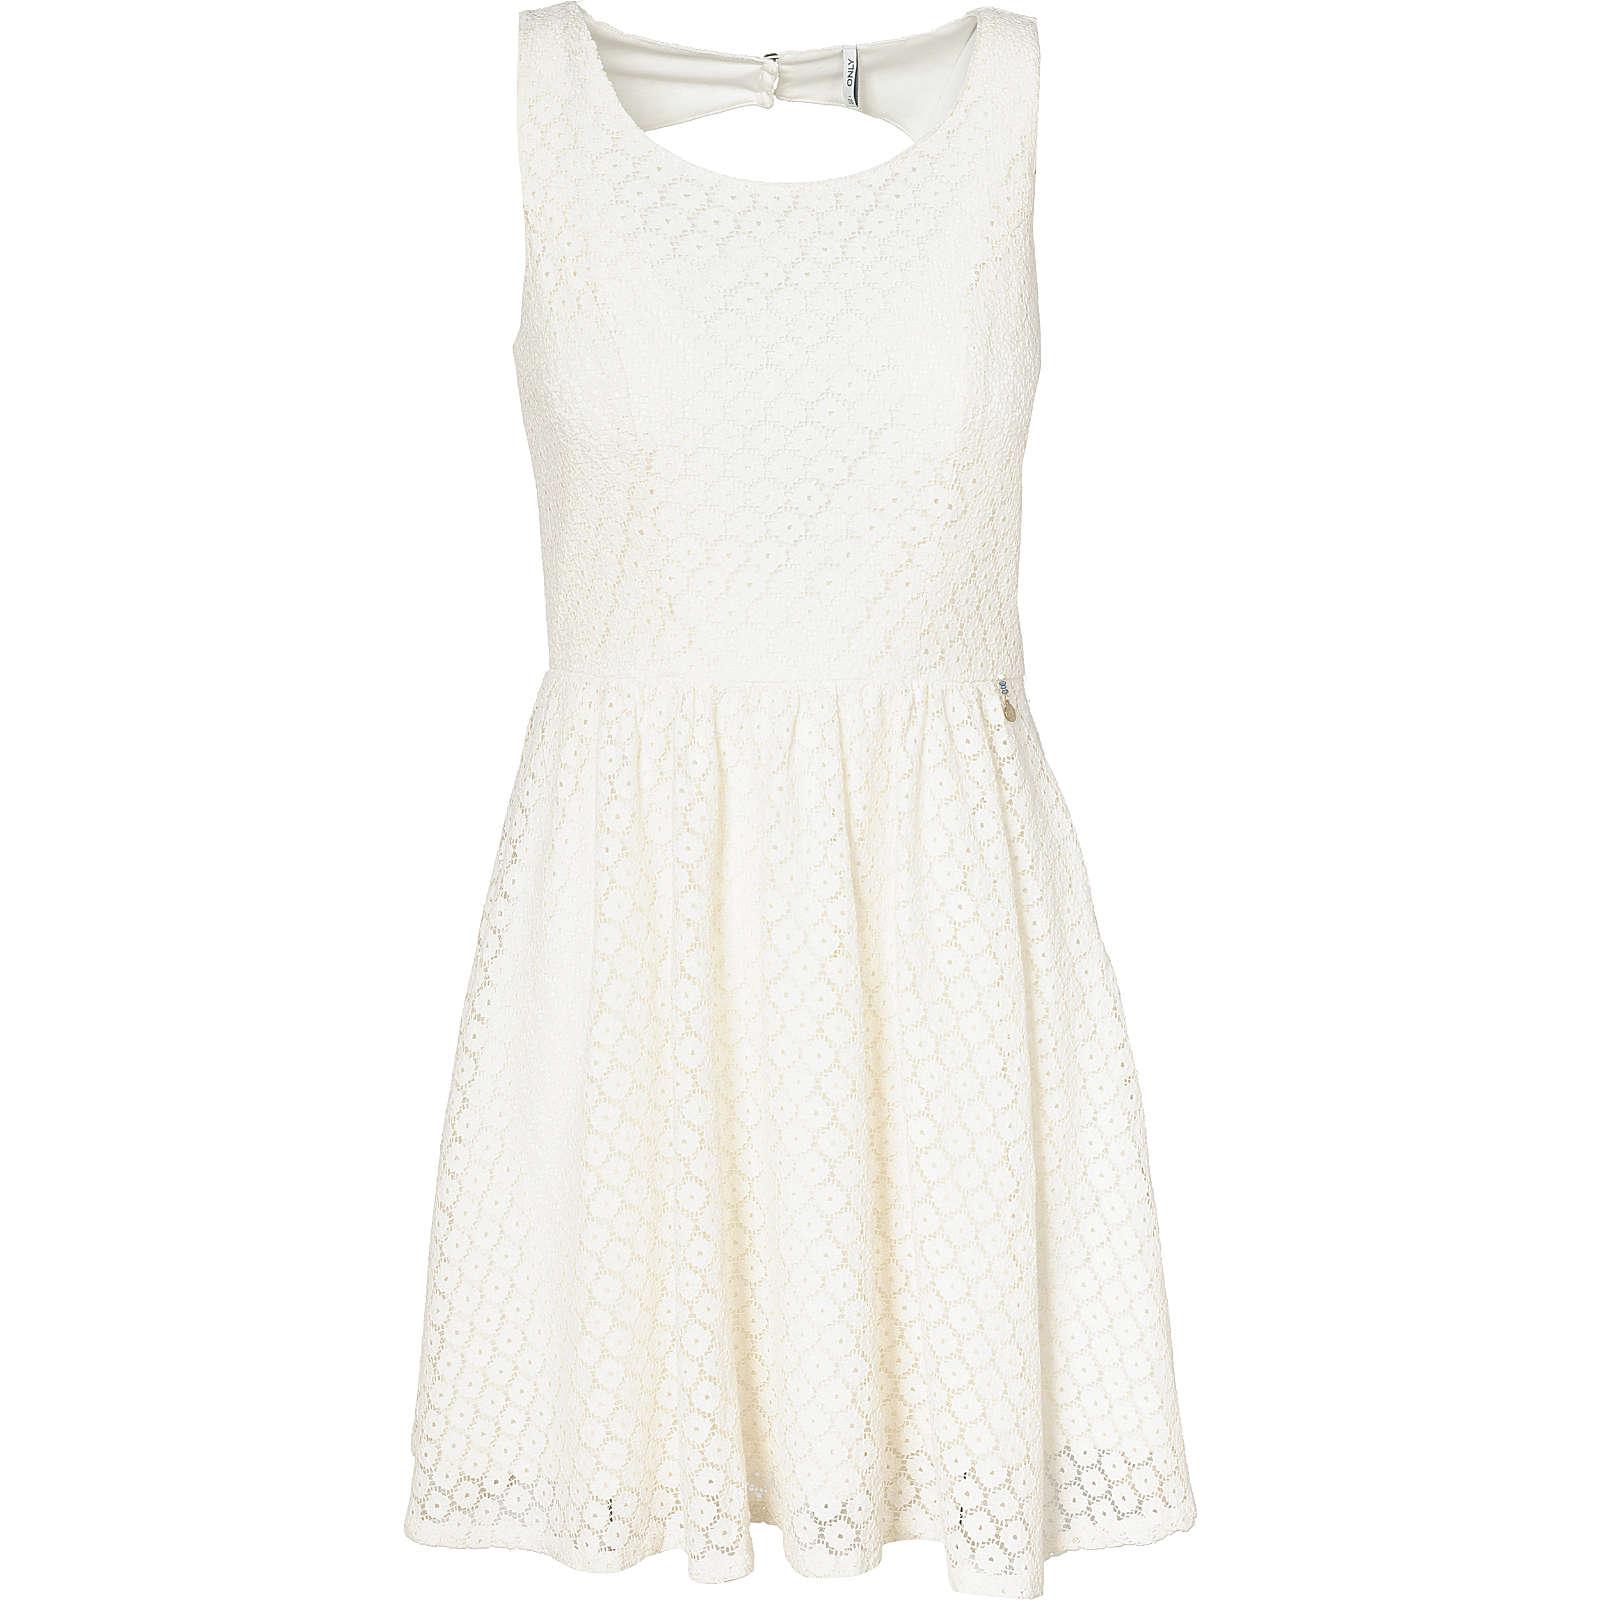 d70e9b2b3a13e0 Rabatt-Preisvergleich.de - Mode & Accessoires > Damenmode > Kleider ...